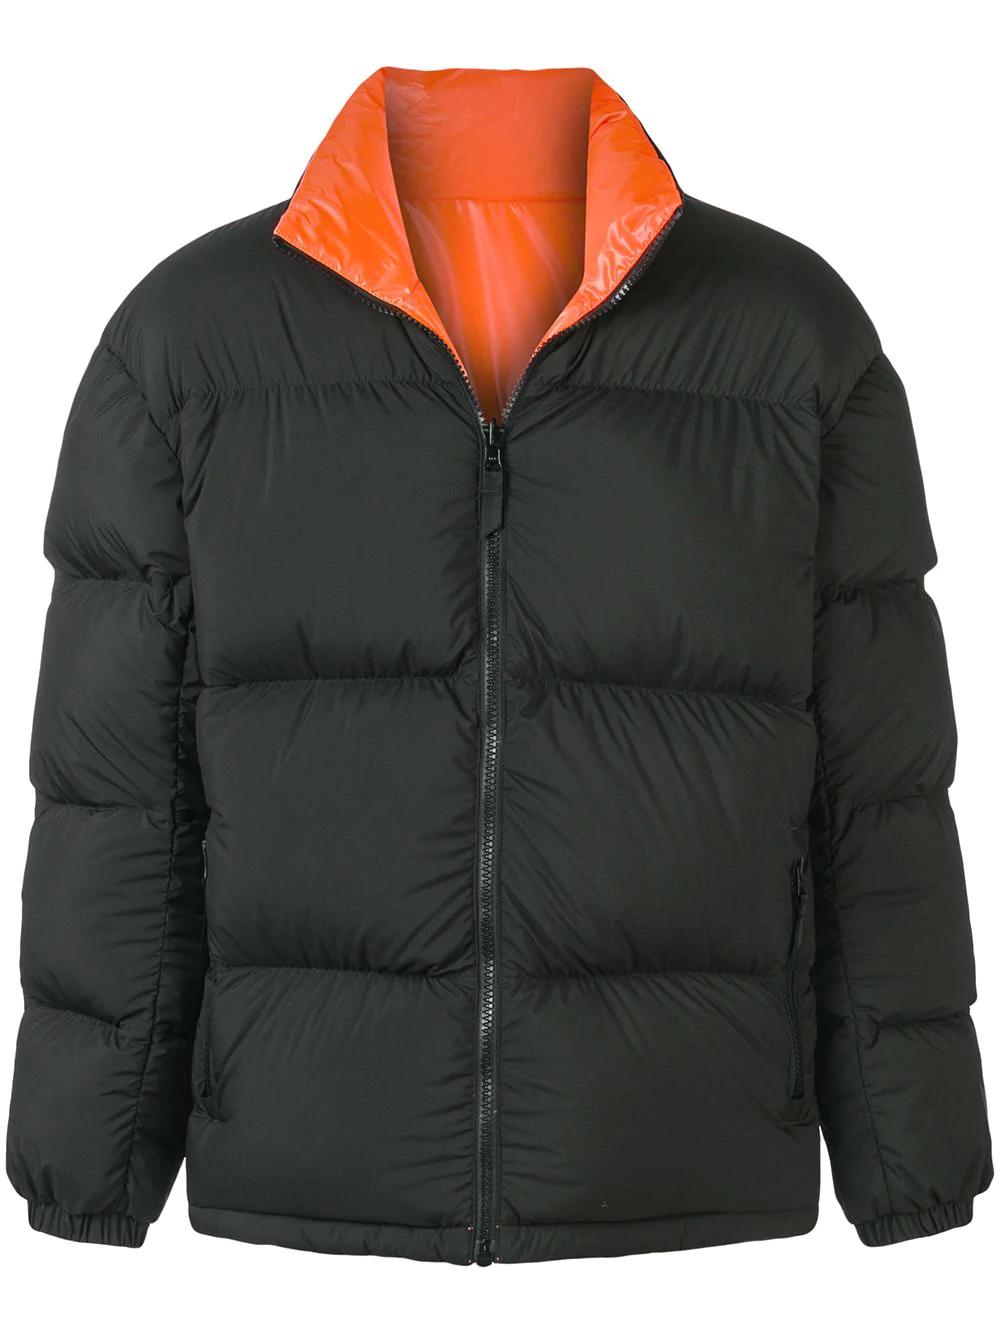 c1def48188f2 Nike Lab Reversible Black And Orange Down Nrg Puffer Jacket